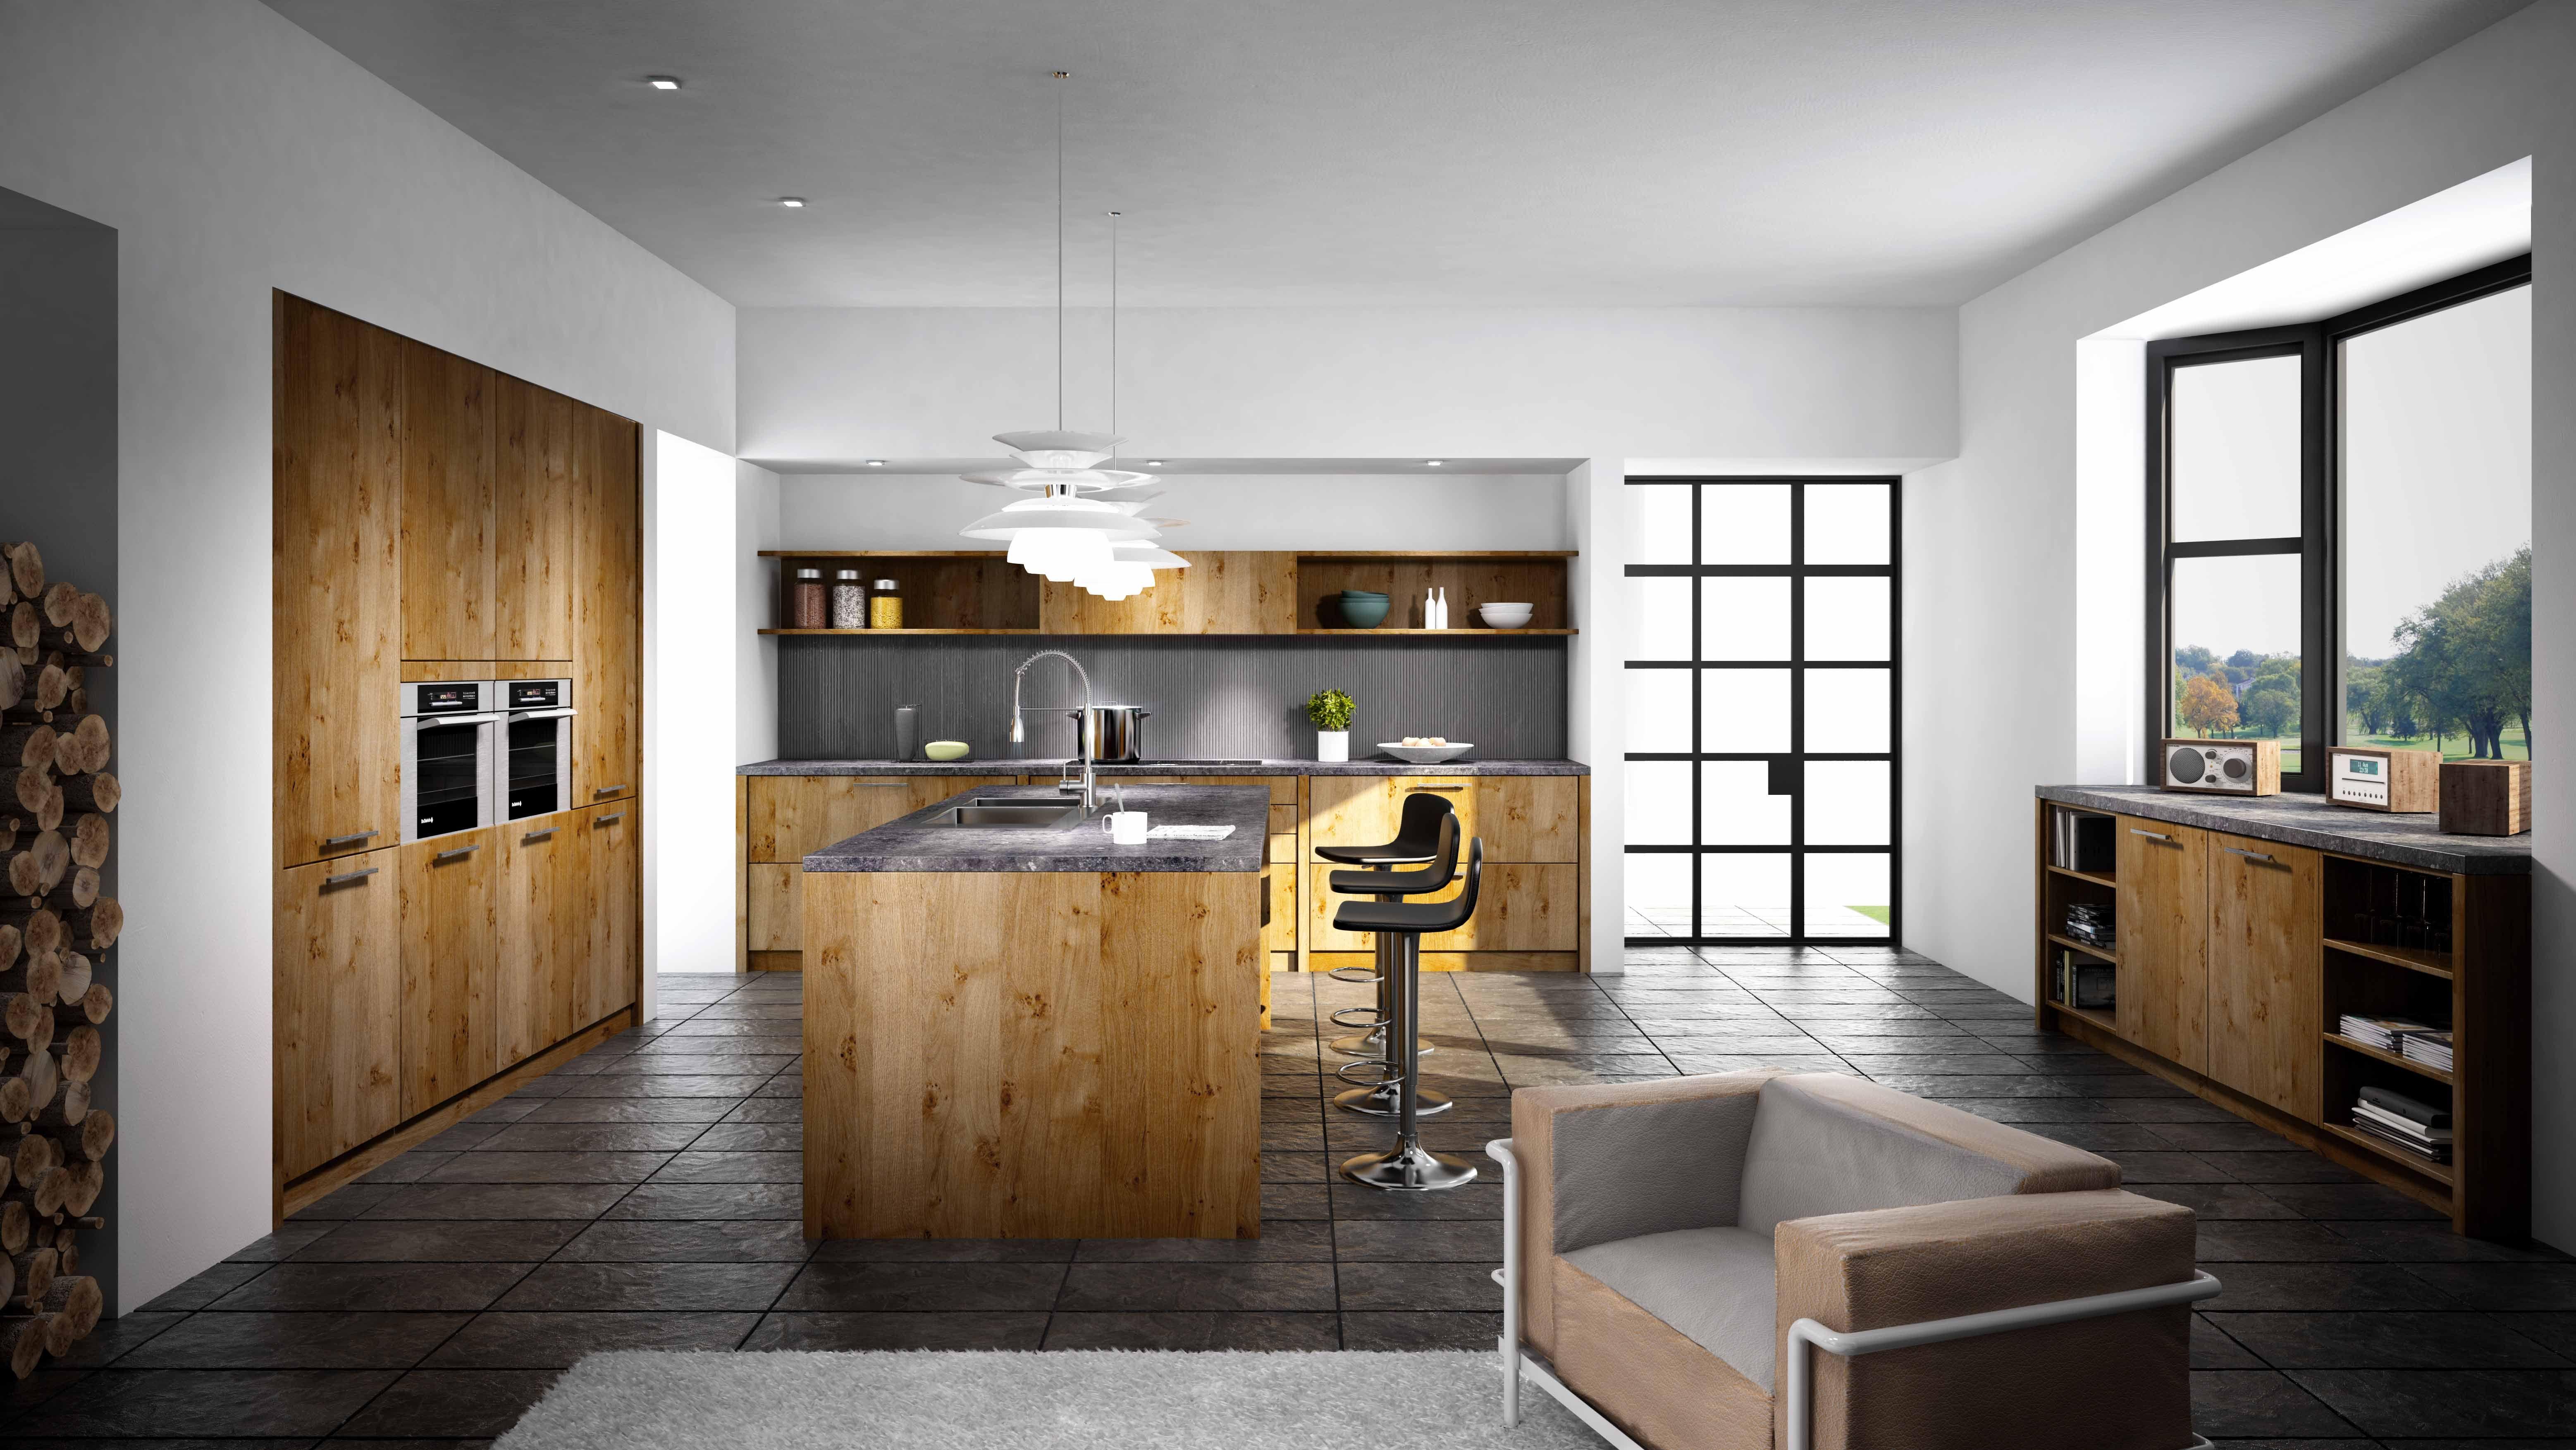 Warme en karaktervolle keuken type artwood in de kleur wild